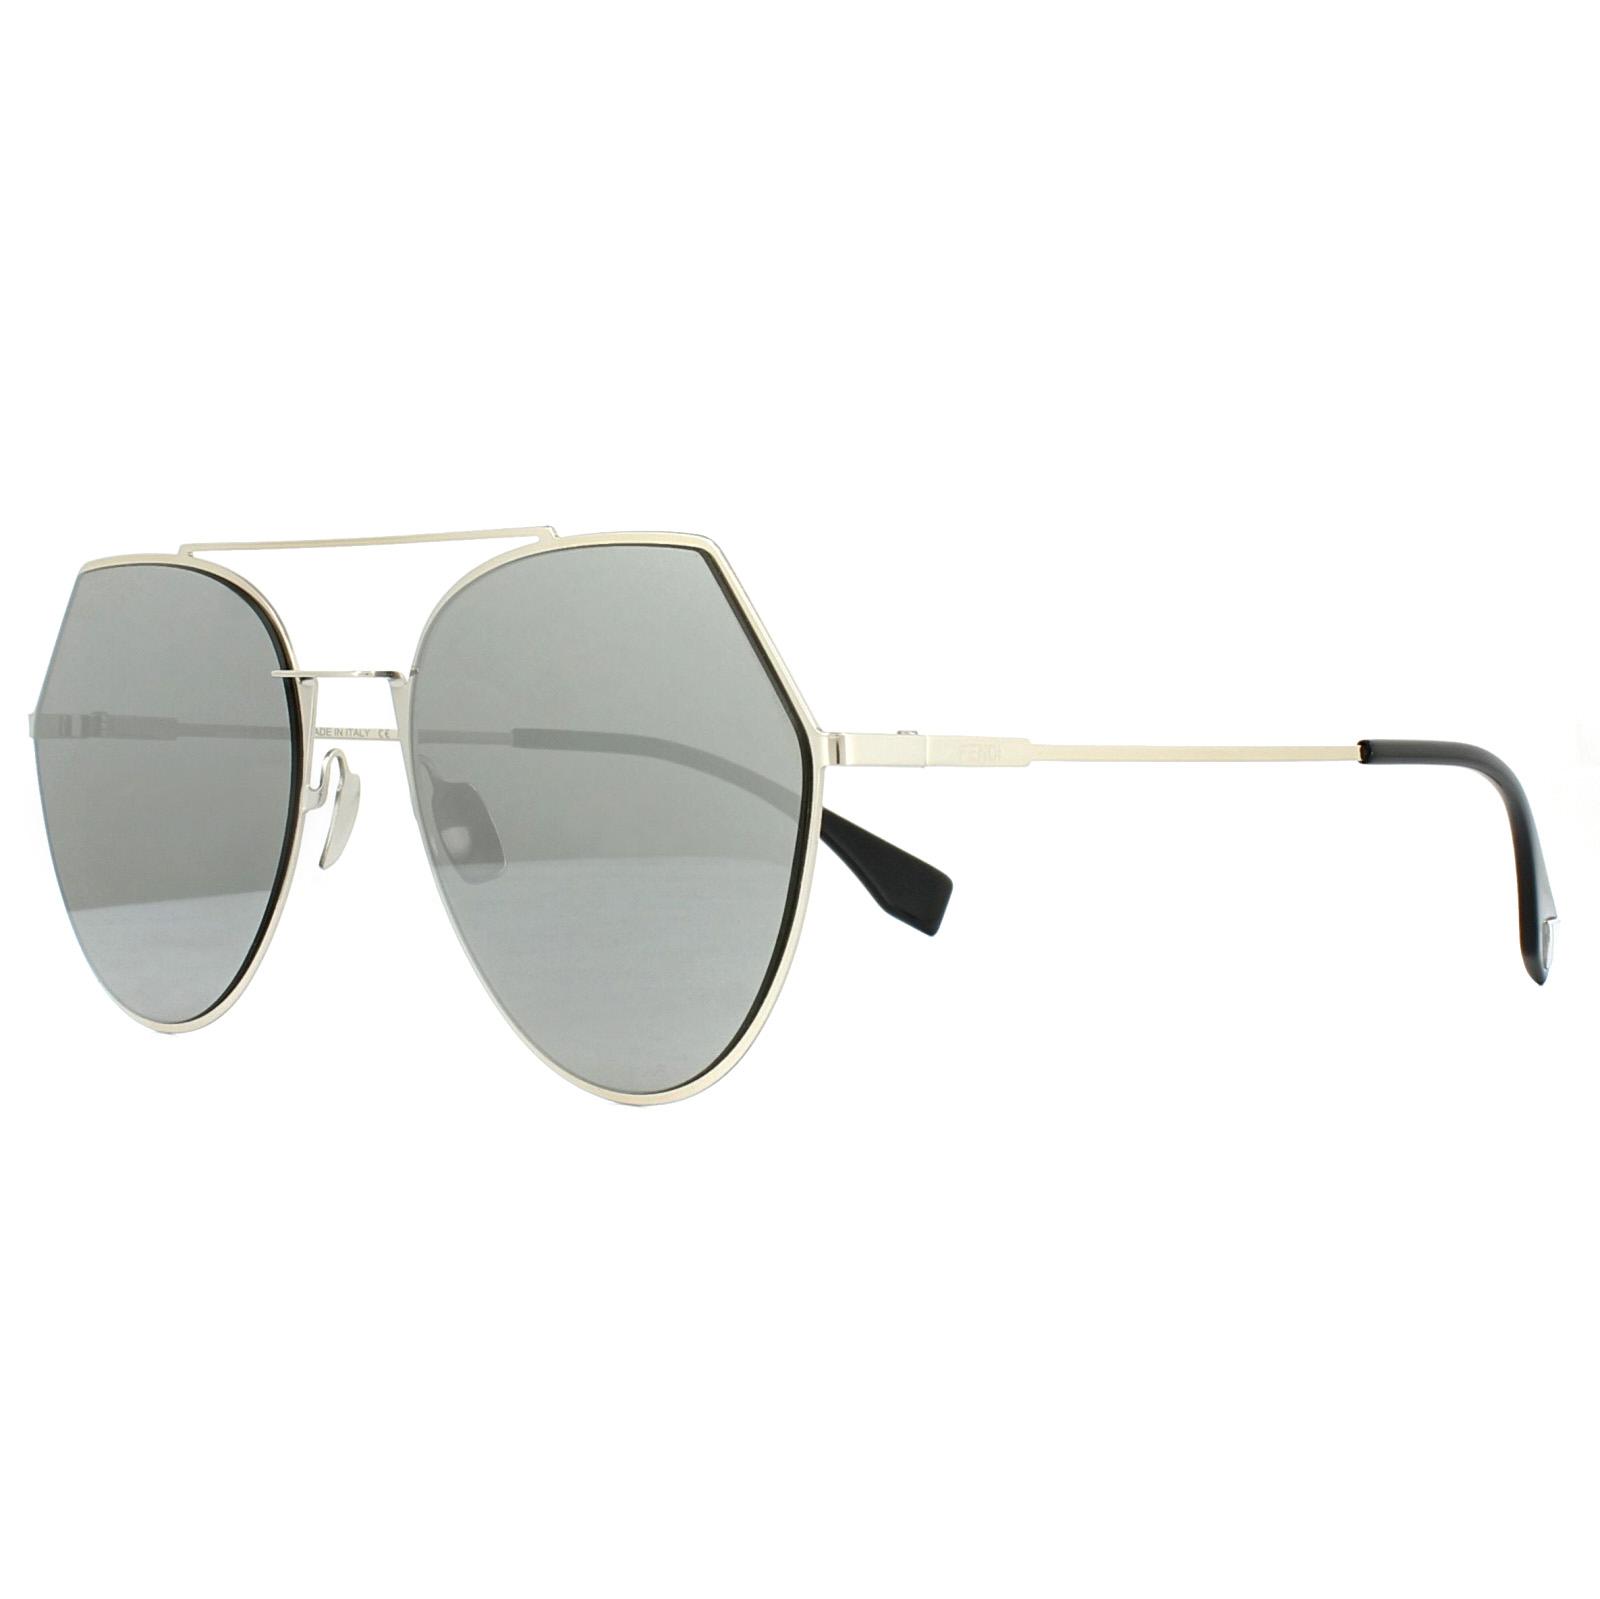 d2d8d9c4c9 Sentinel Fendi Sunglasses Eyeline FF 0194 S 3YG 0T Light Gold Grey Silver